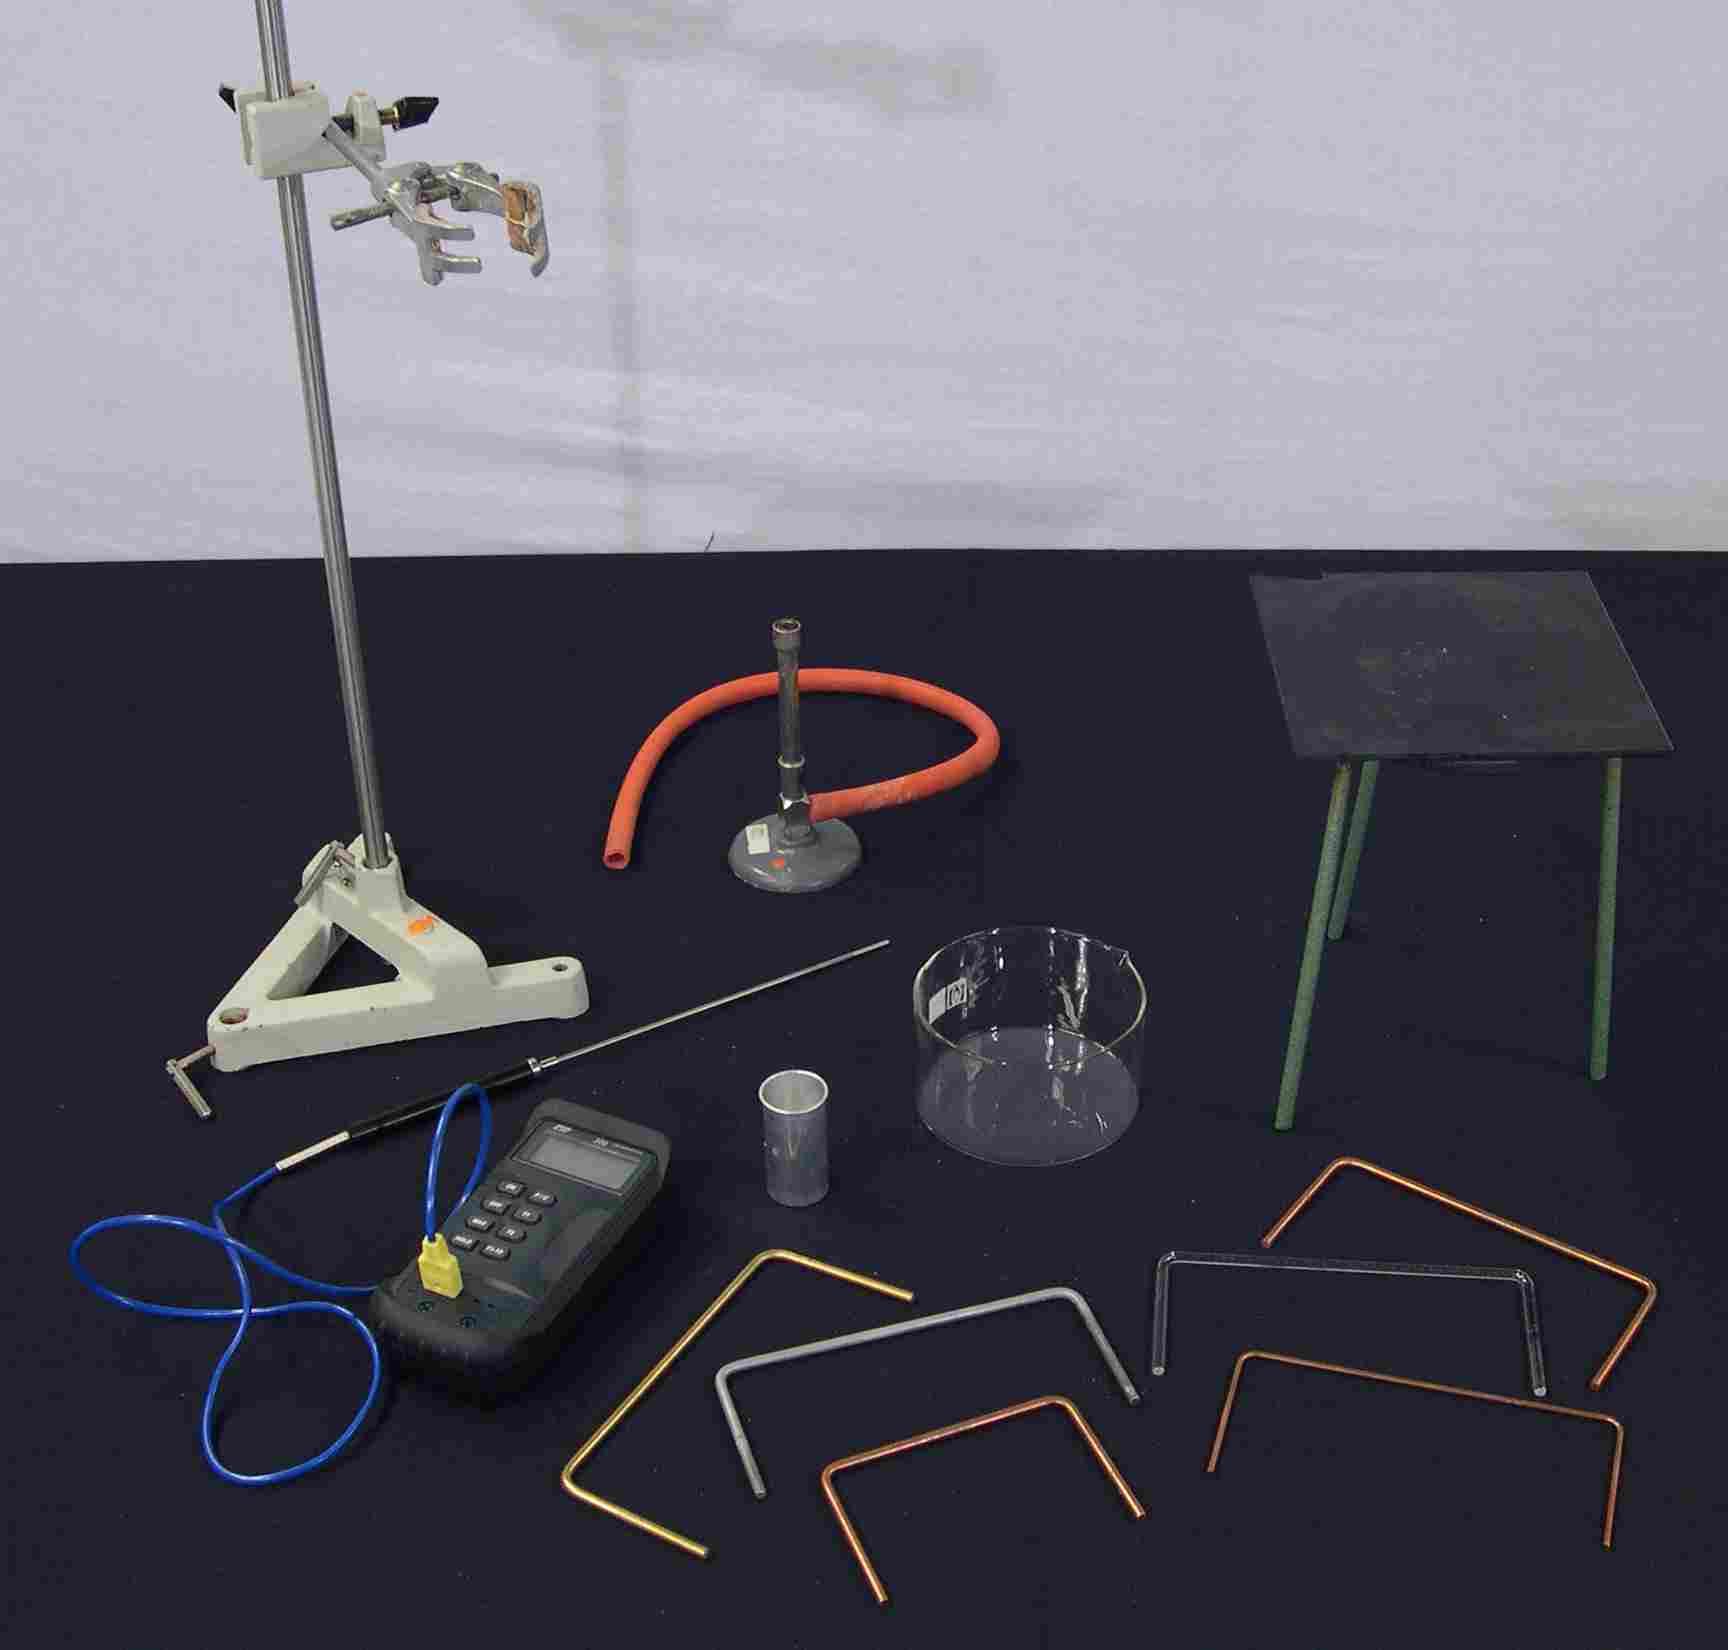 praktikum atomphysik und thermodynamik termin t4. Black Bedroom Furniture Sets. Home Design Ideas